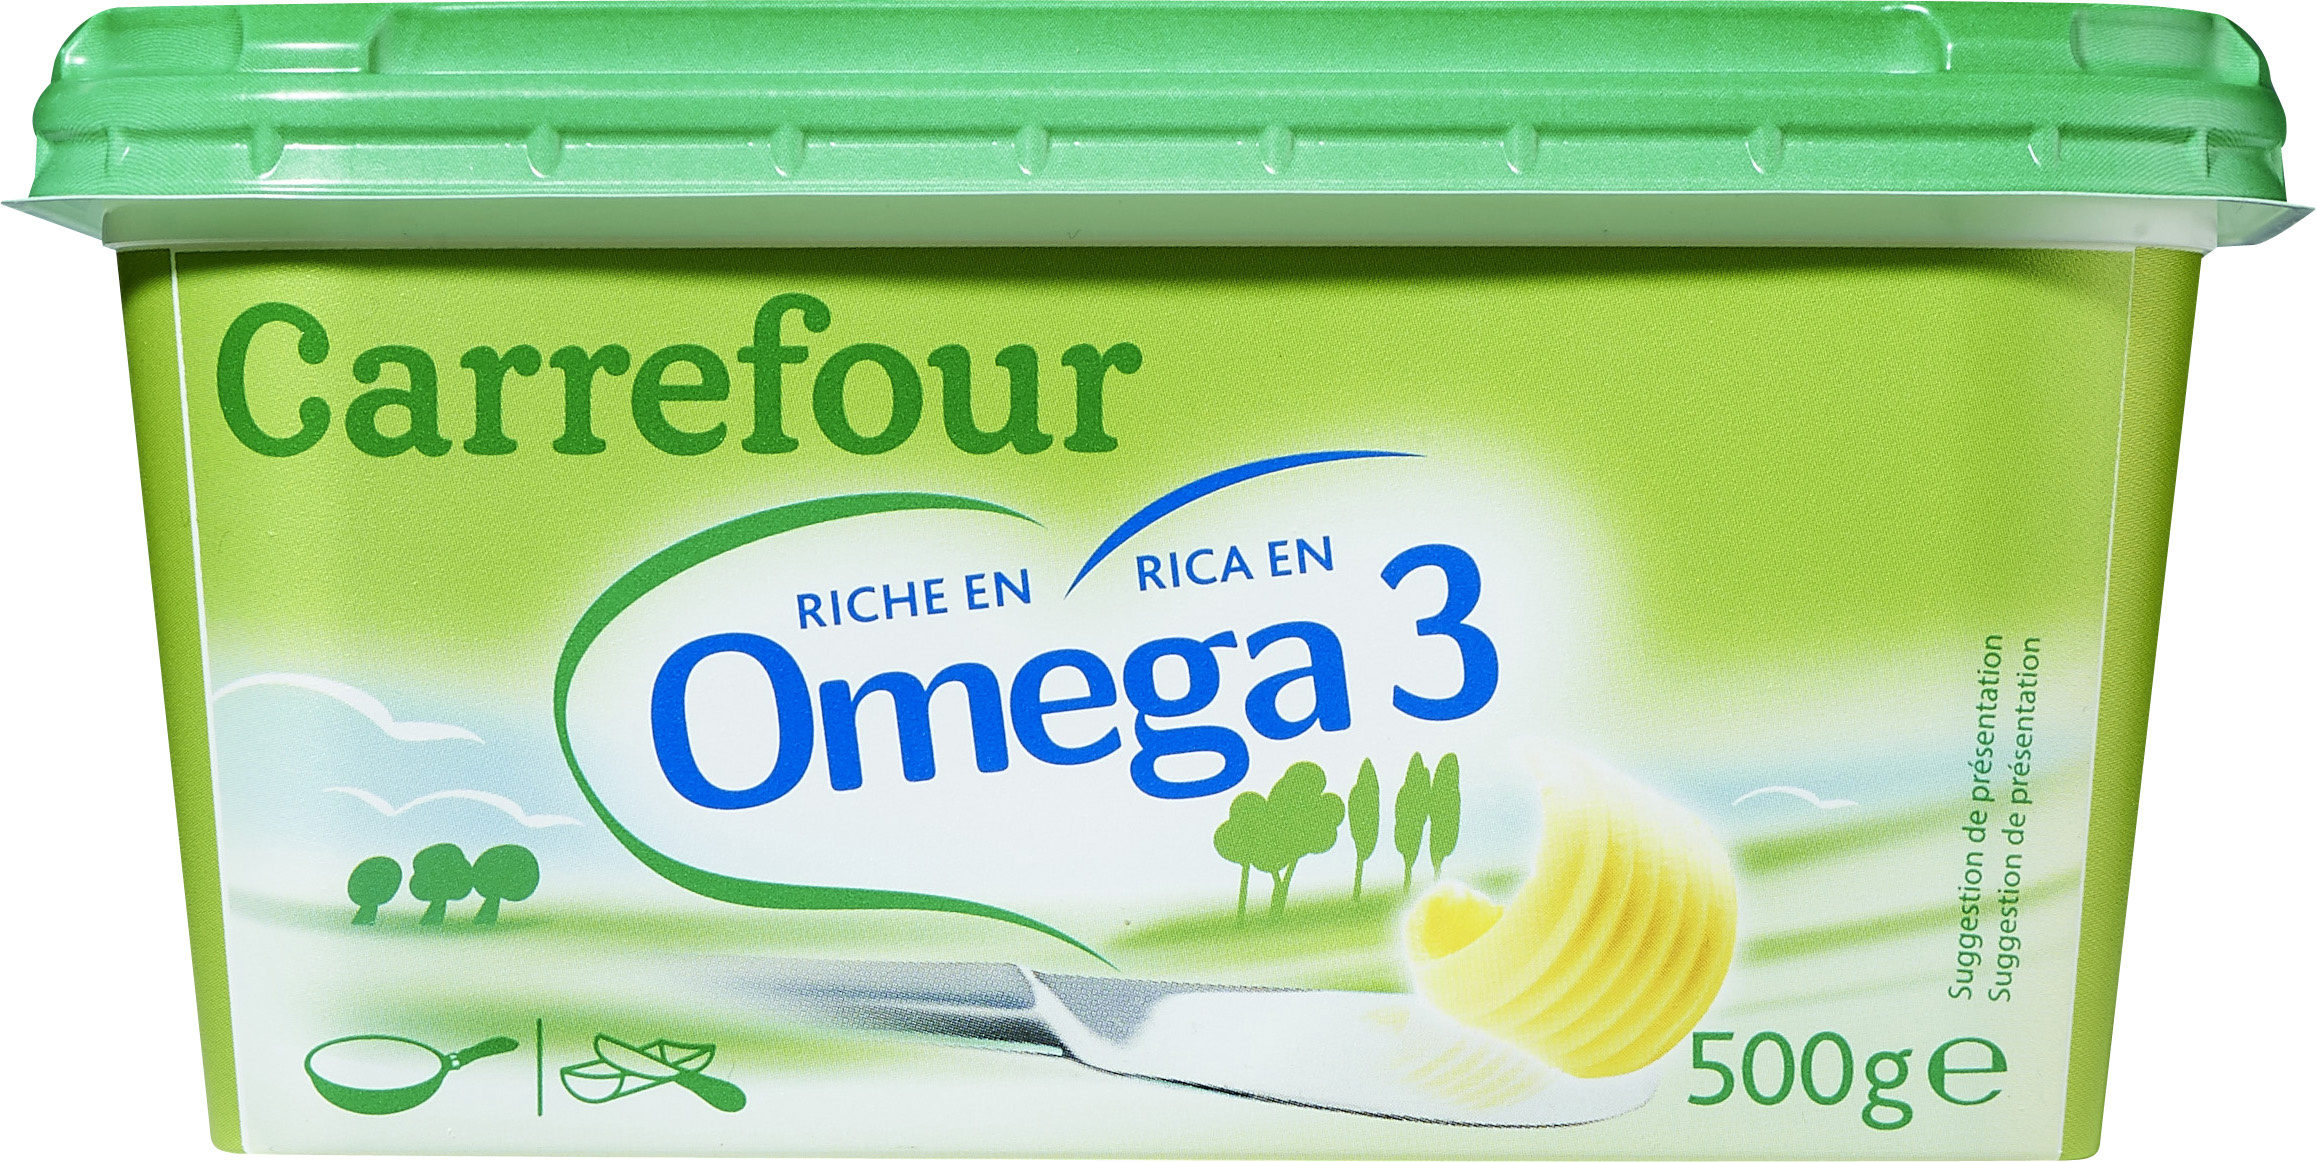 Margarina tres cuartos omega-3 - Producte - es